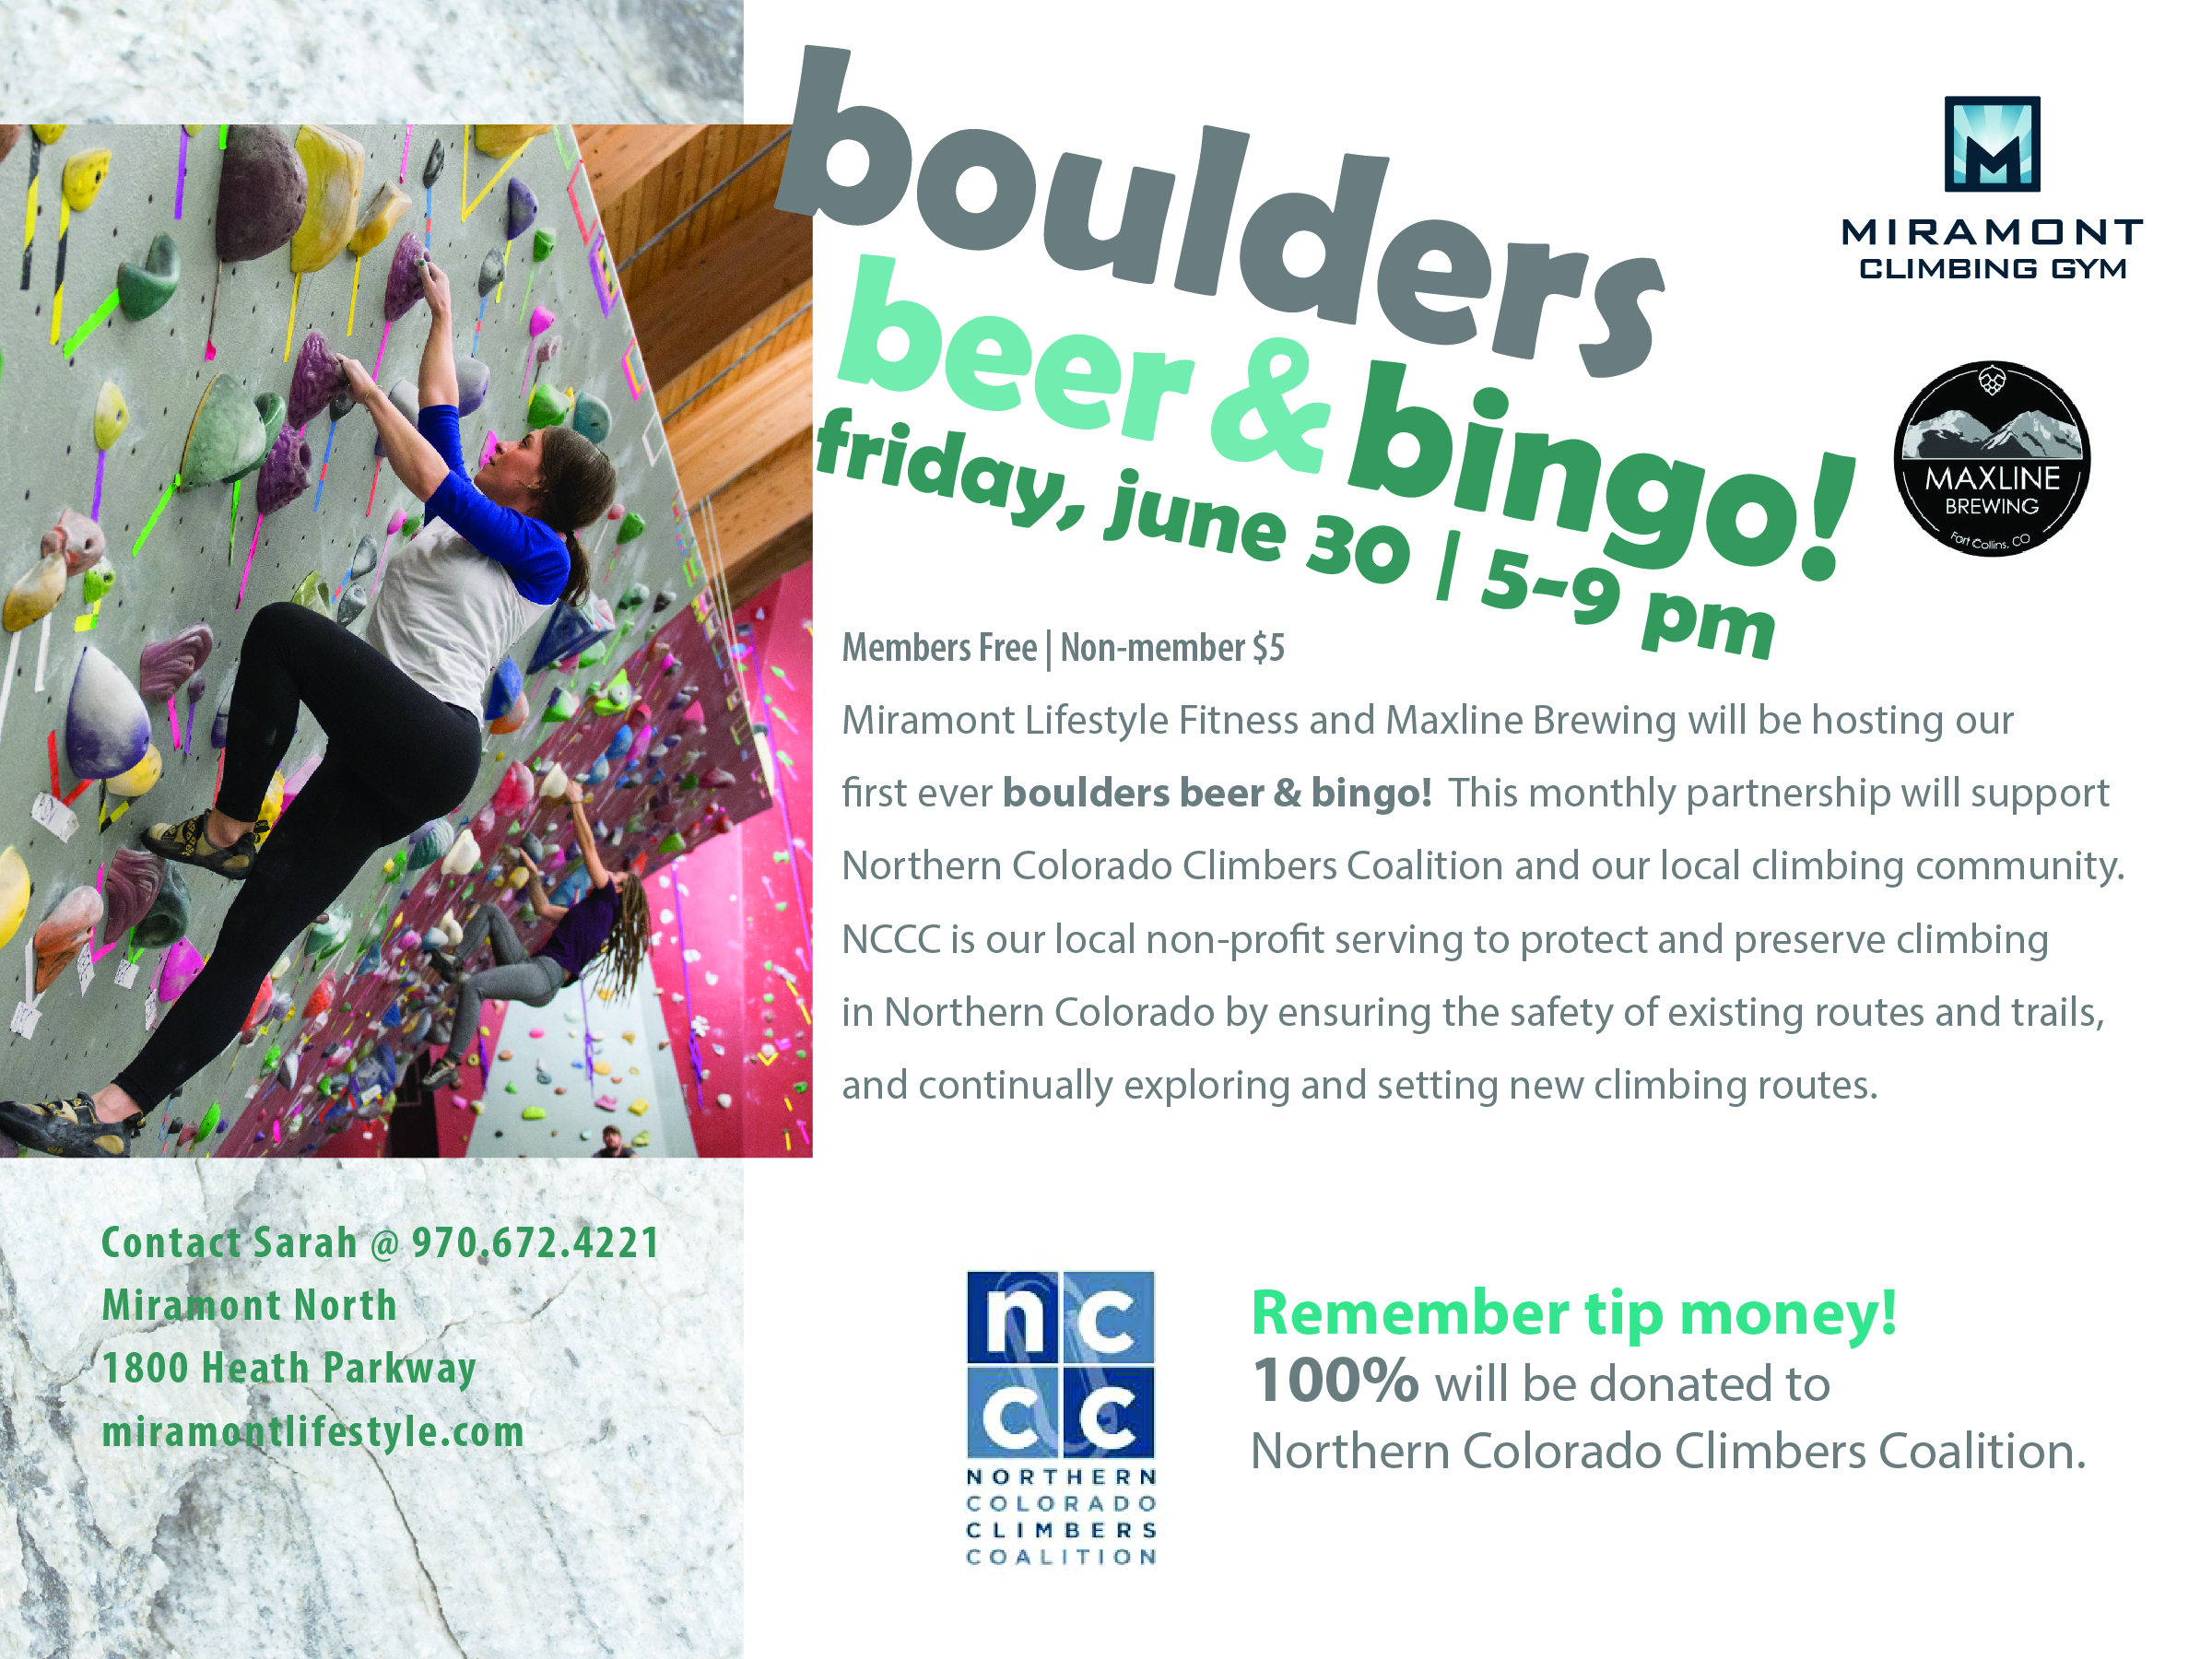 wall-boulder-beer-bingo-may-fs-01